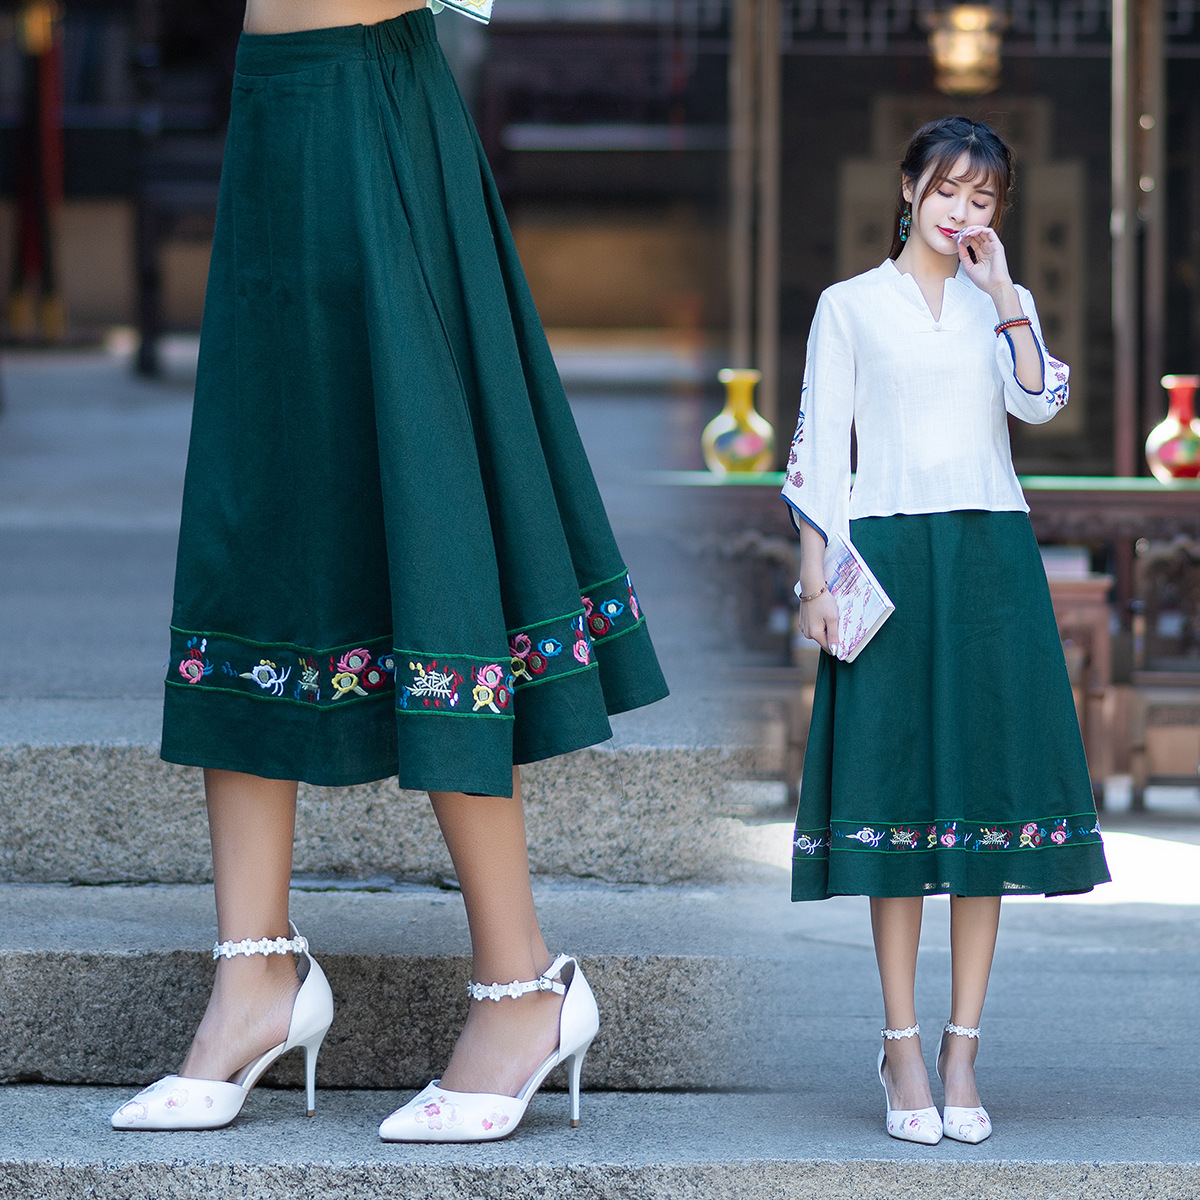 Sf06146 Feimina 2019 Autumn New Style Ethnic-Style Big Hemline Embroidery Skirt